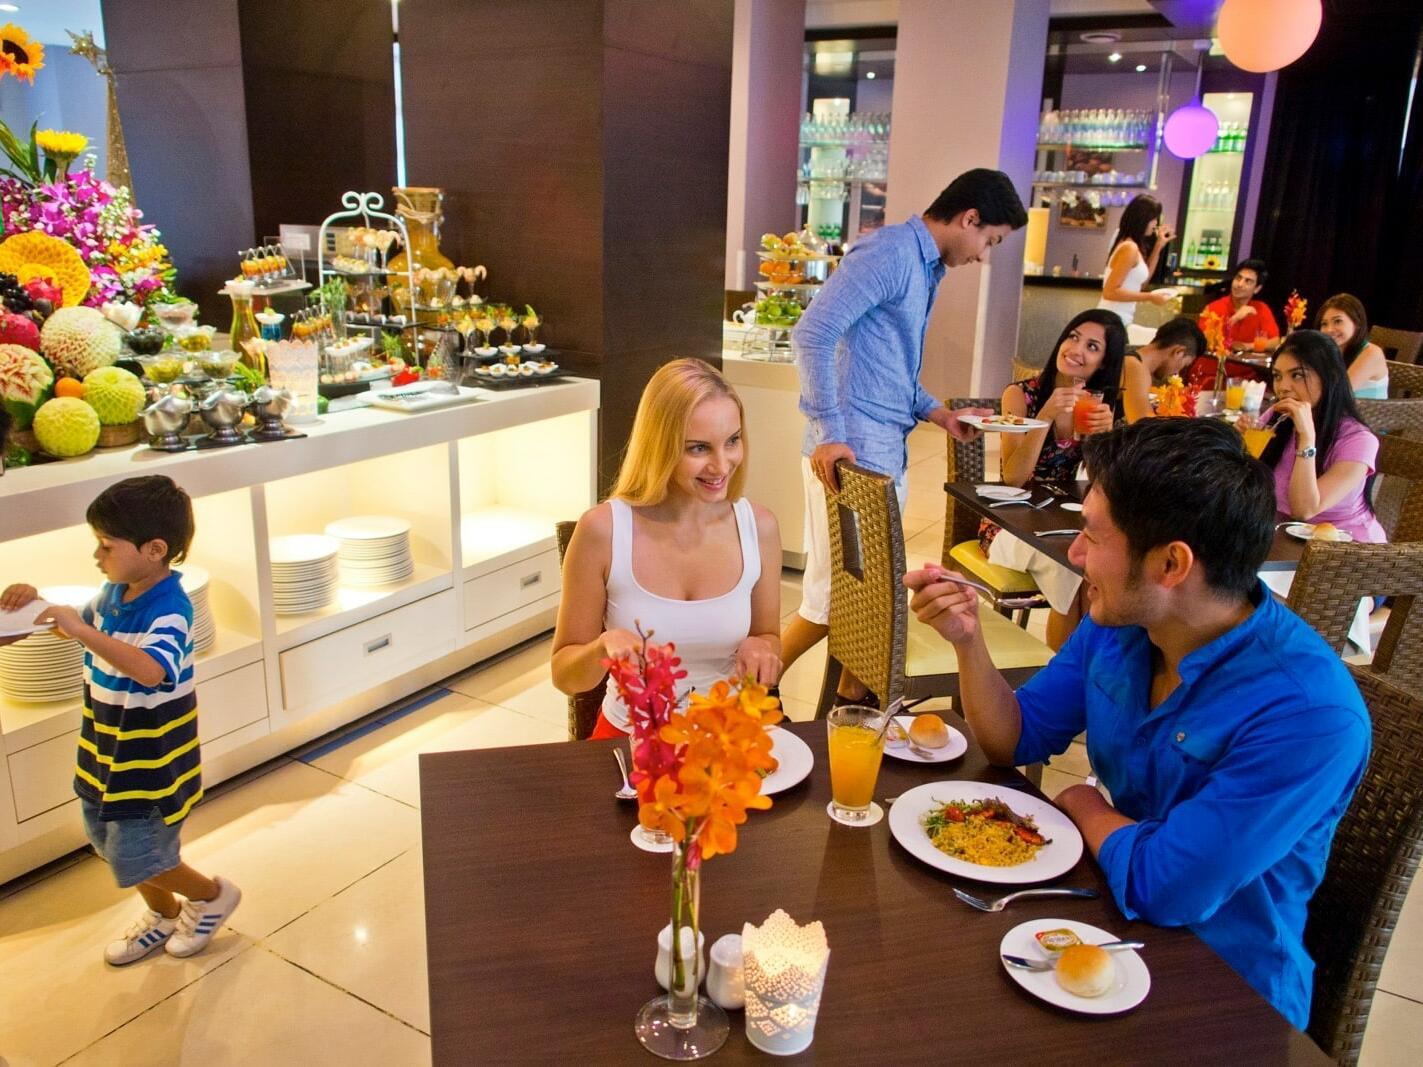 People enjoying the buffet at the Fresh Restaurant